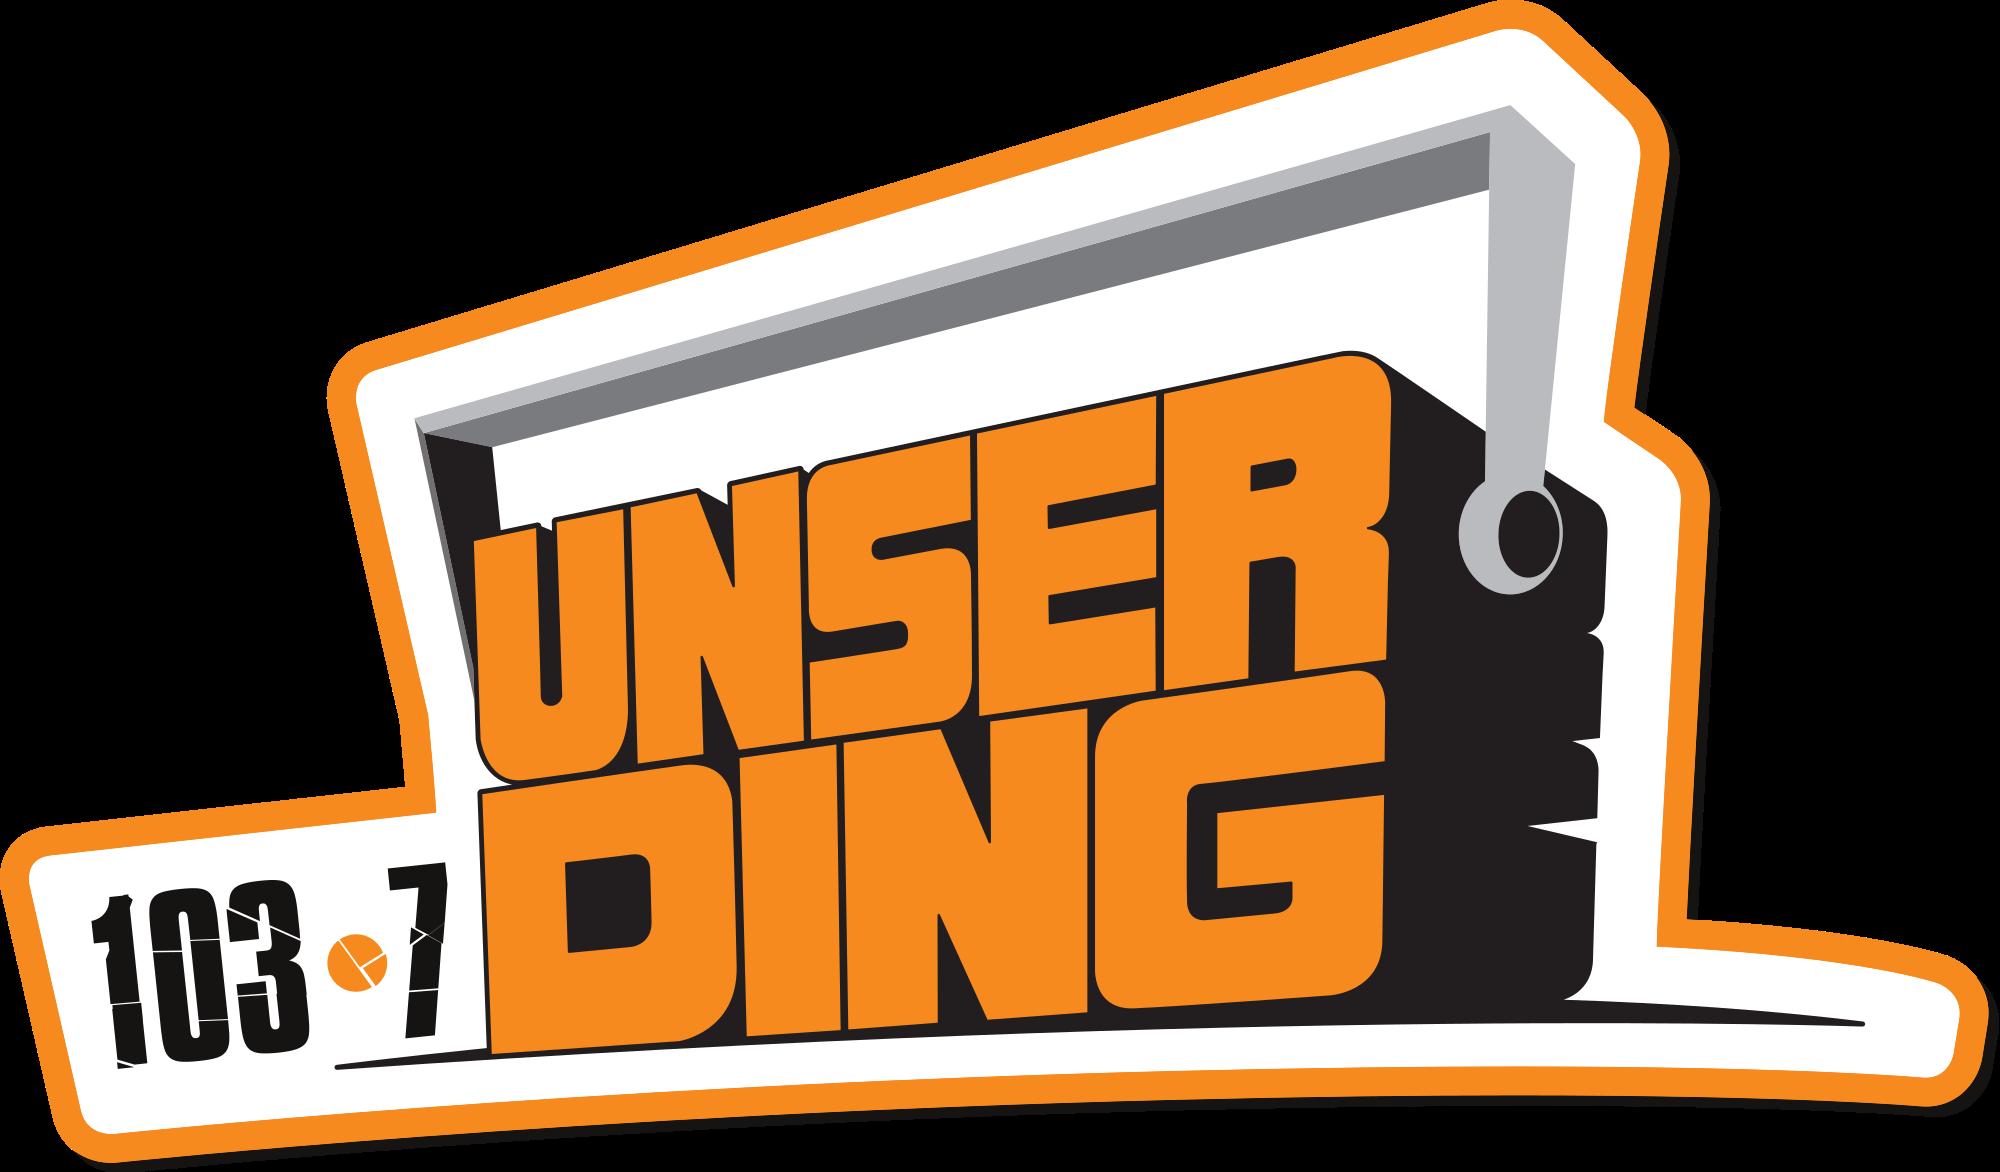 UnserDing.png